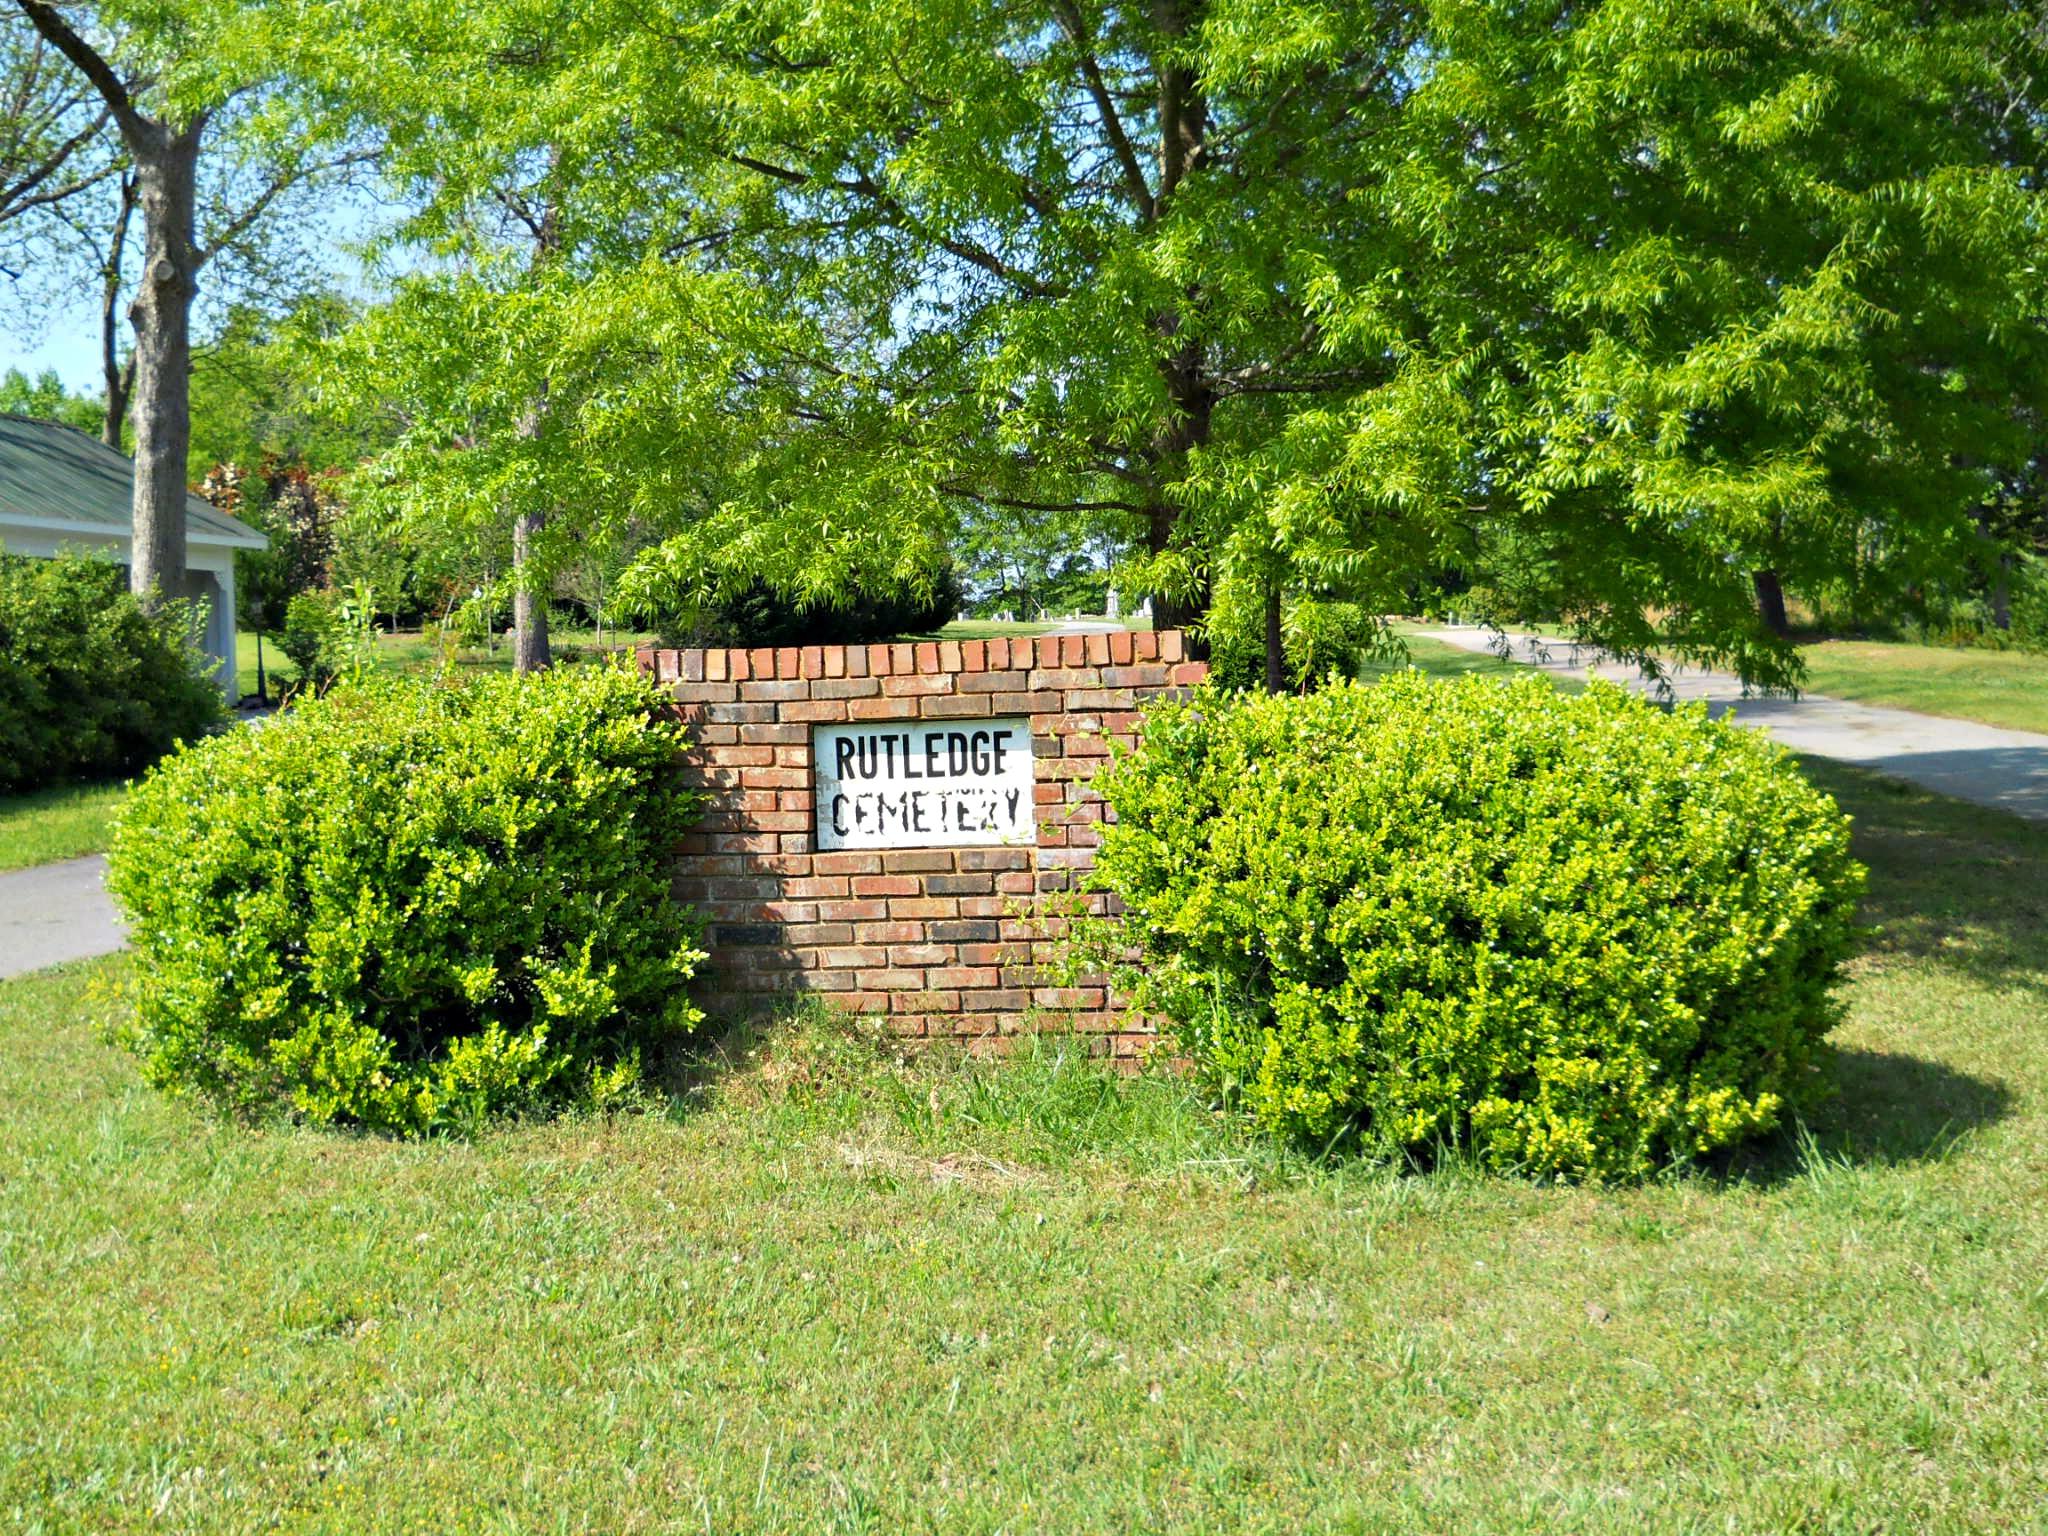 Rutledge City Cemetery